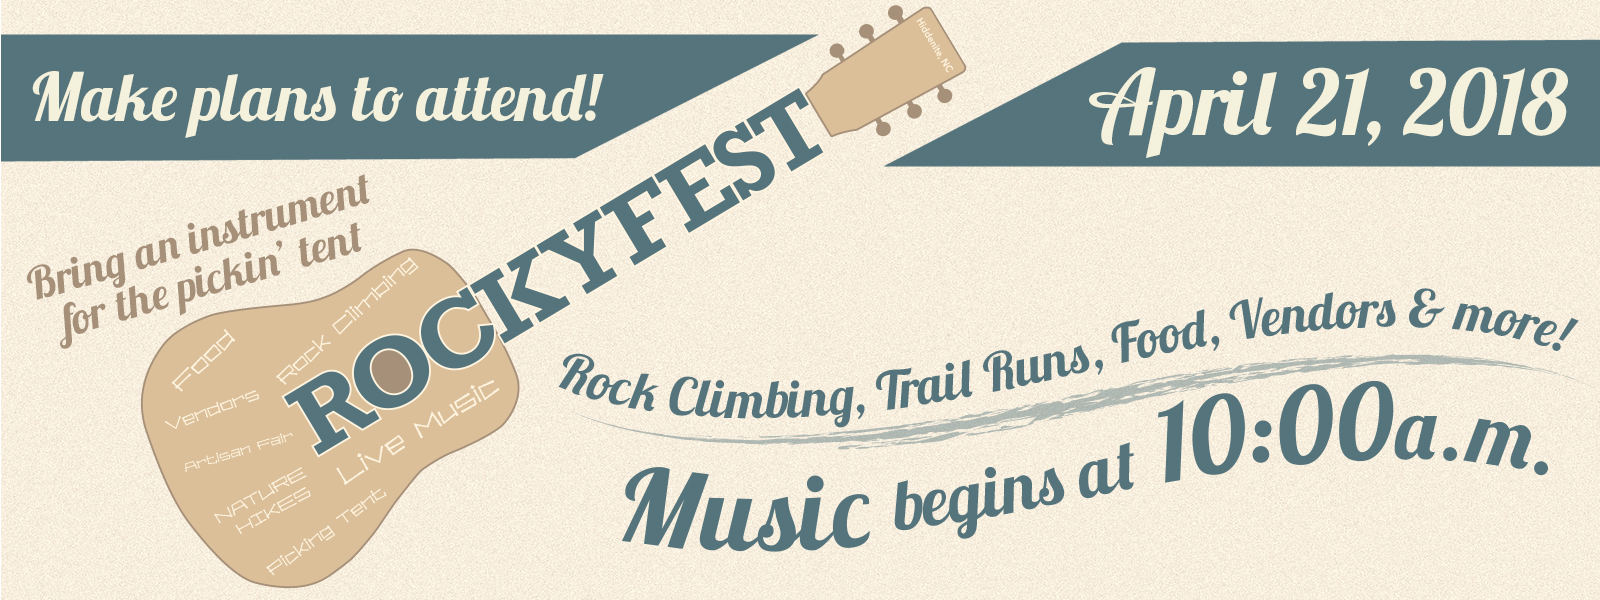 RockyFest - Saturday, April 21